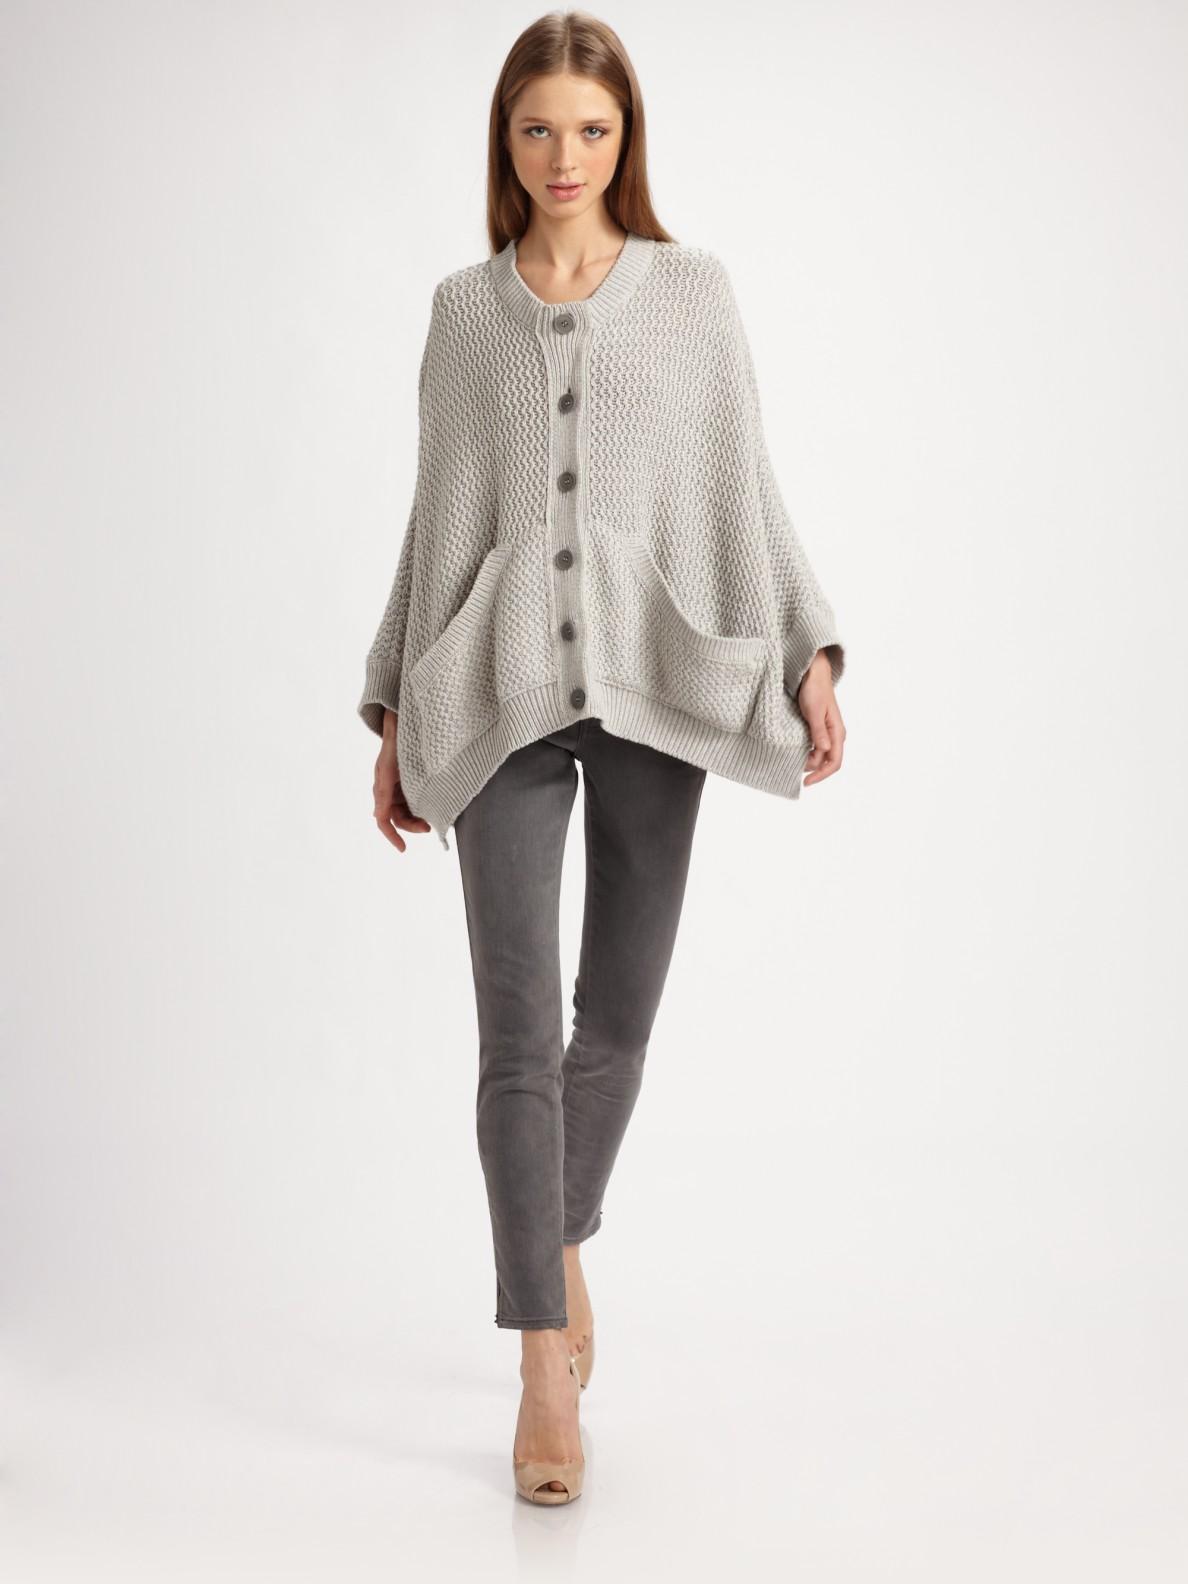 Lyst - Splendid Duster Metallic Cotton-blend Cardigan in Gray